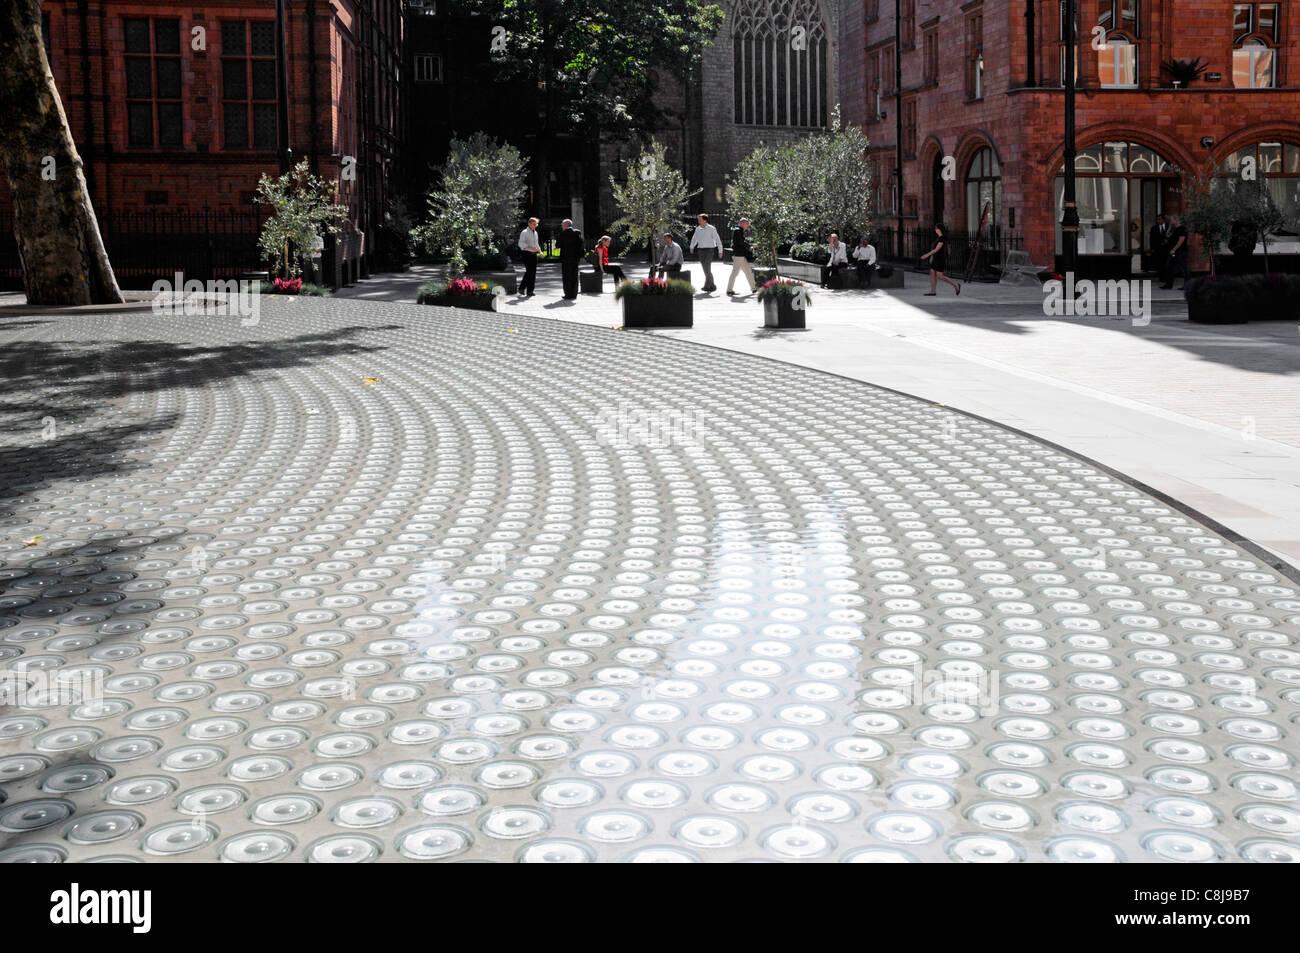 London street scene Carlos Place & Mount Street Mayfair pavement refurbishment glass lenses in 'Silence' - Stock Image